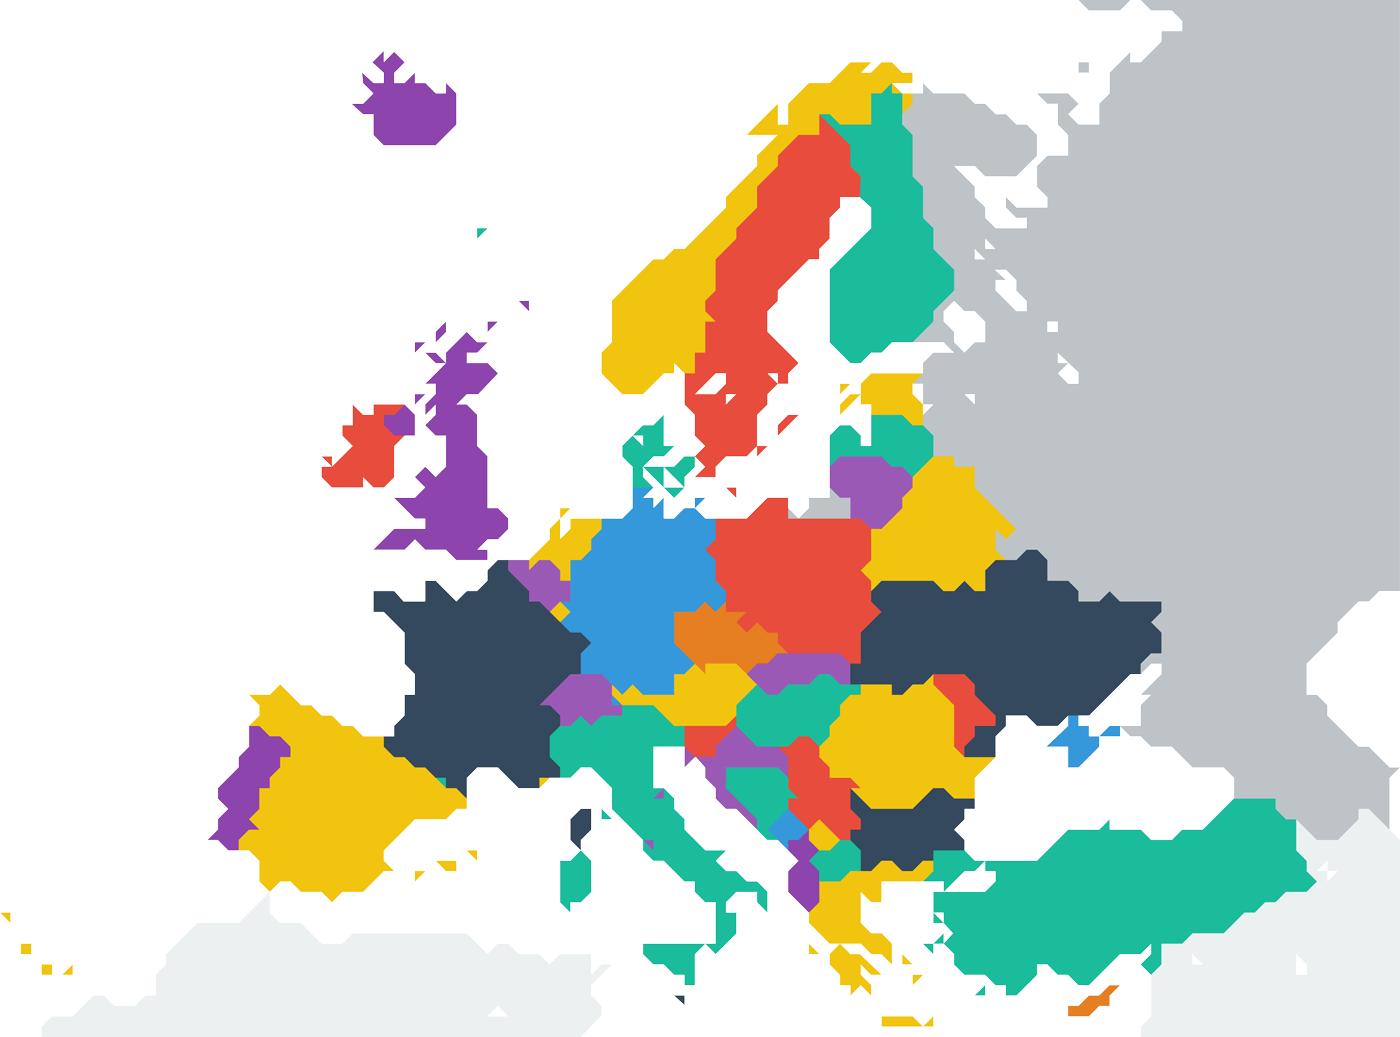 Europakarte_neu.png